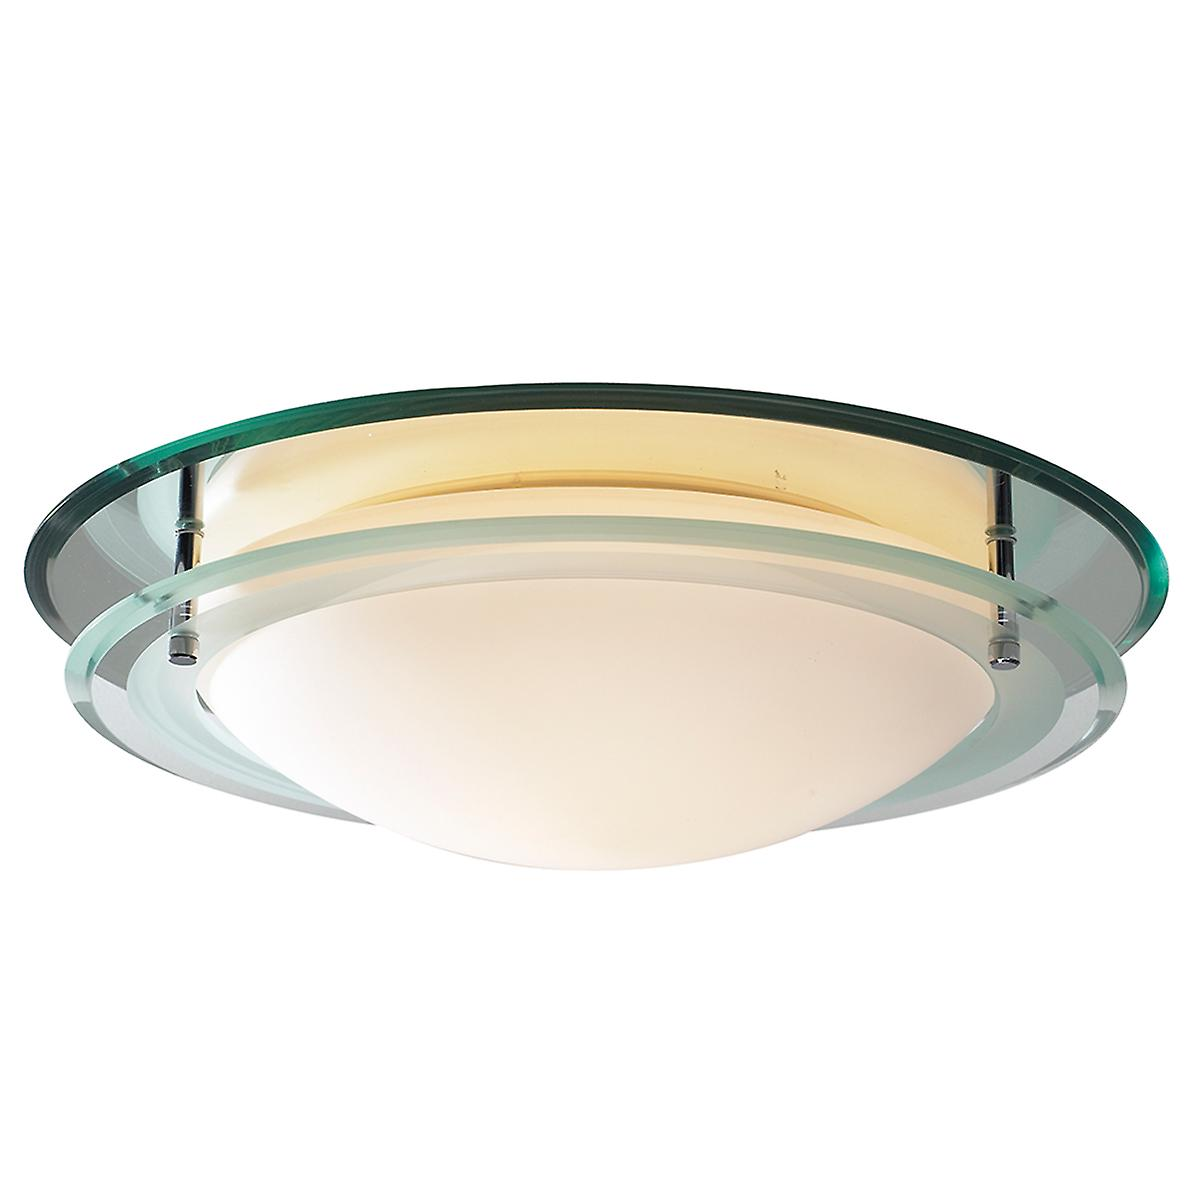 Dar OSI502 Osis Mirrored Flush Bathroom Light Ip44 Rated